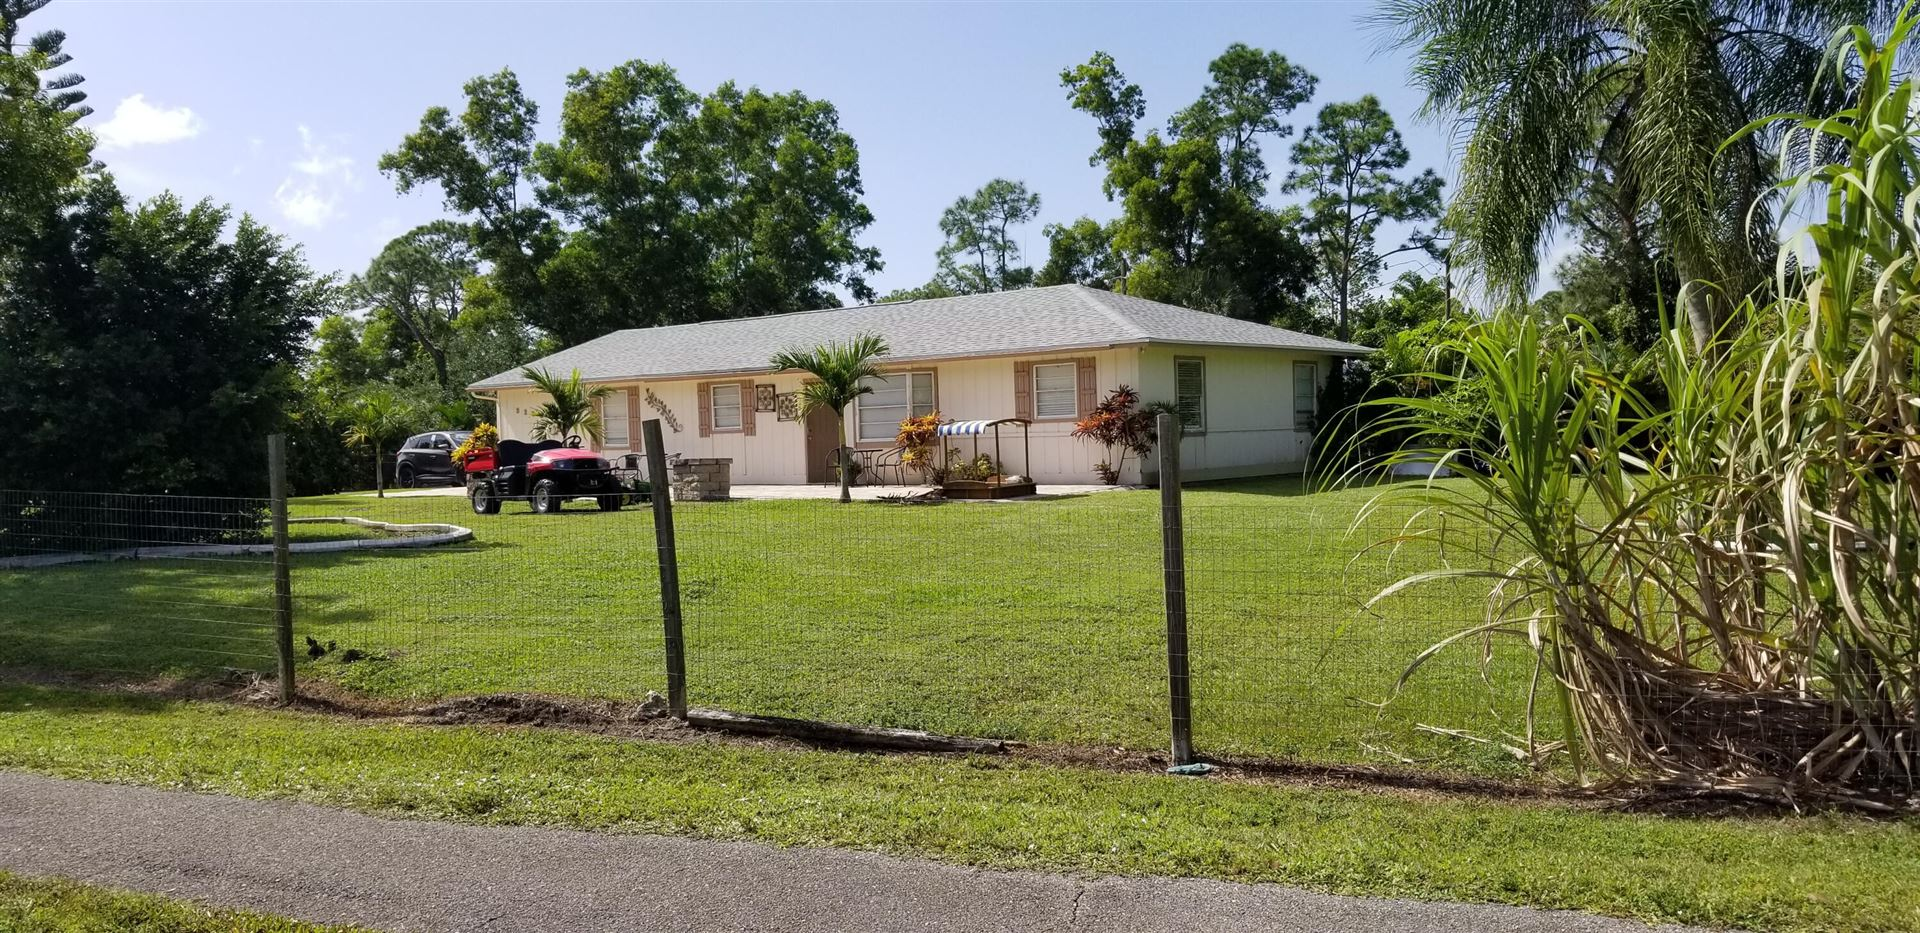 5209 Coconut Boulevard, West Palm Beach, FL 33411 - MLS#: RX-10754175